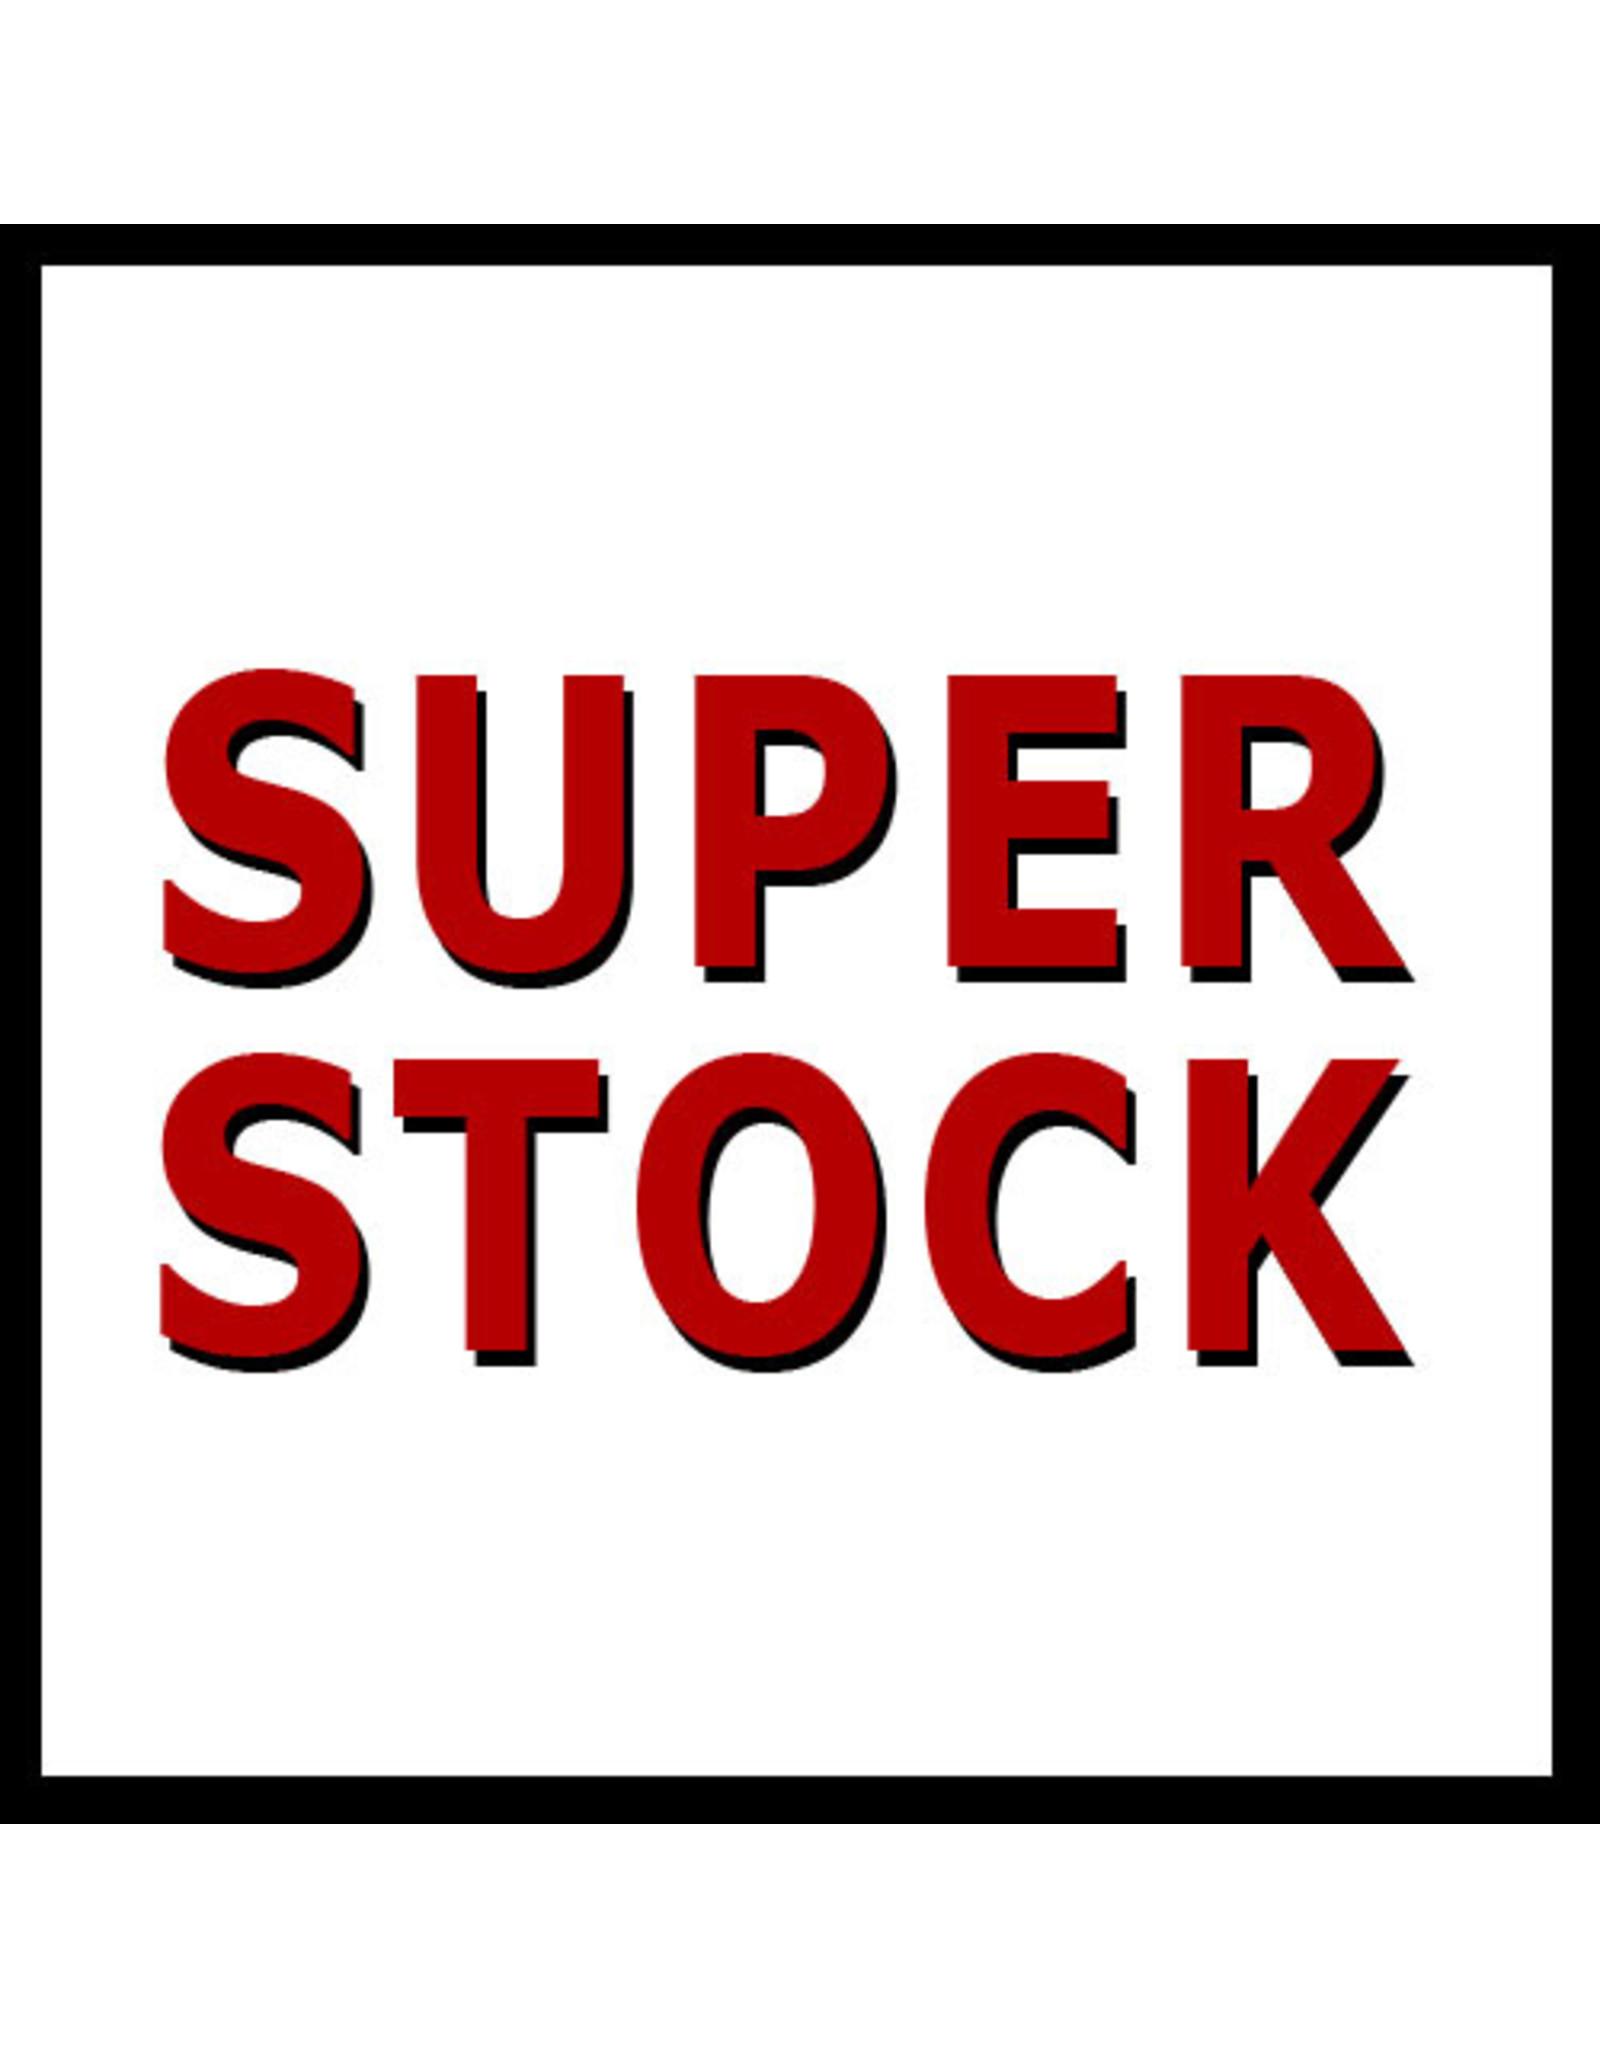 Tracks Hobbies SUPER STOCK: 10/25/2020